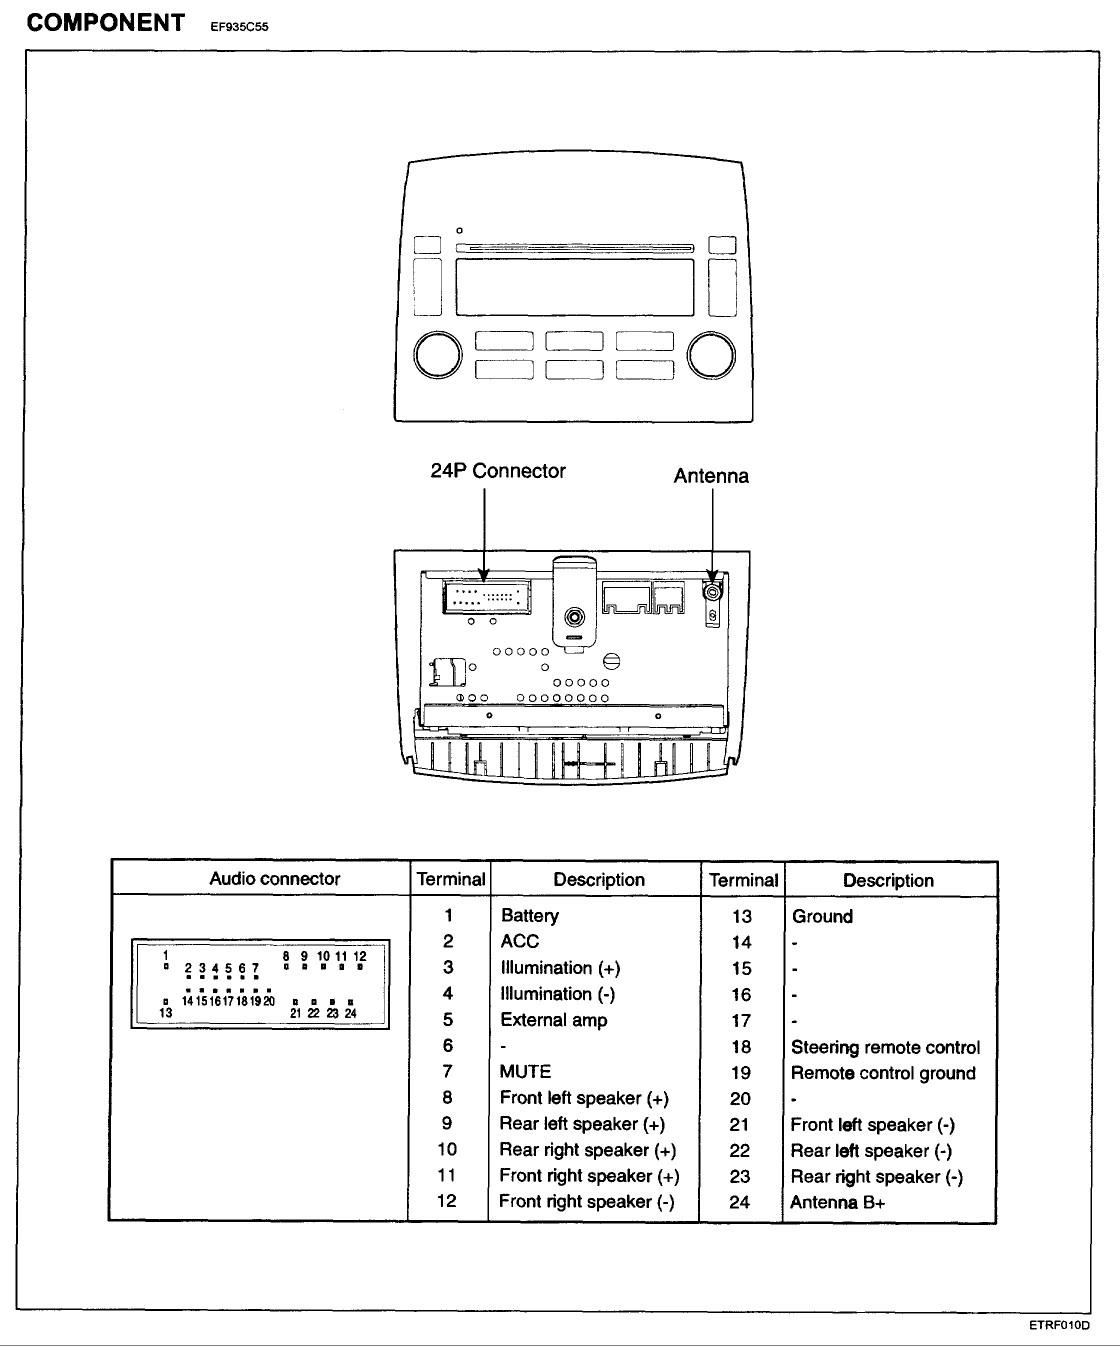 hyundai sonata wiring diagram Collection-Category Wiring Diagram 106 Hyundai Wiring Diagrams Free Luxury Hyundai Wiring Diagrams Free 1-t